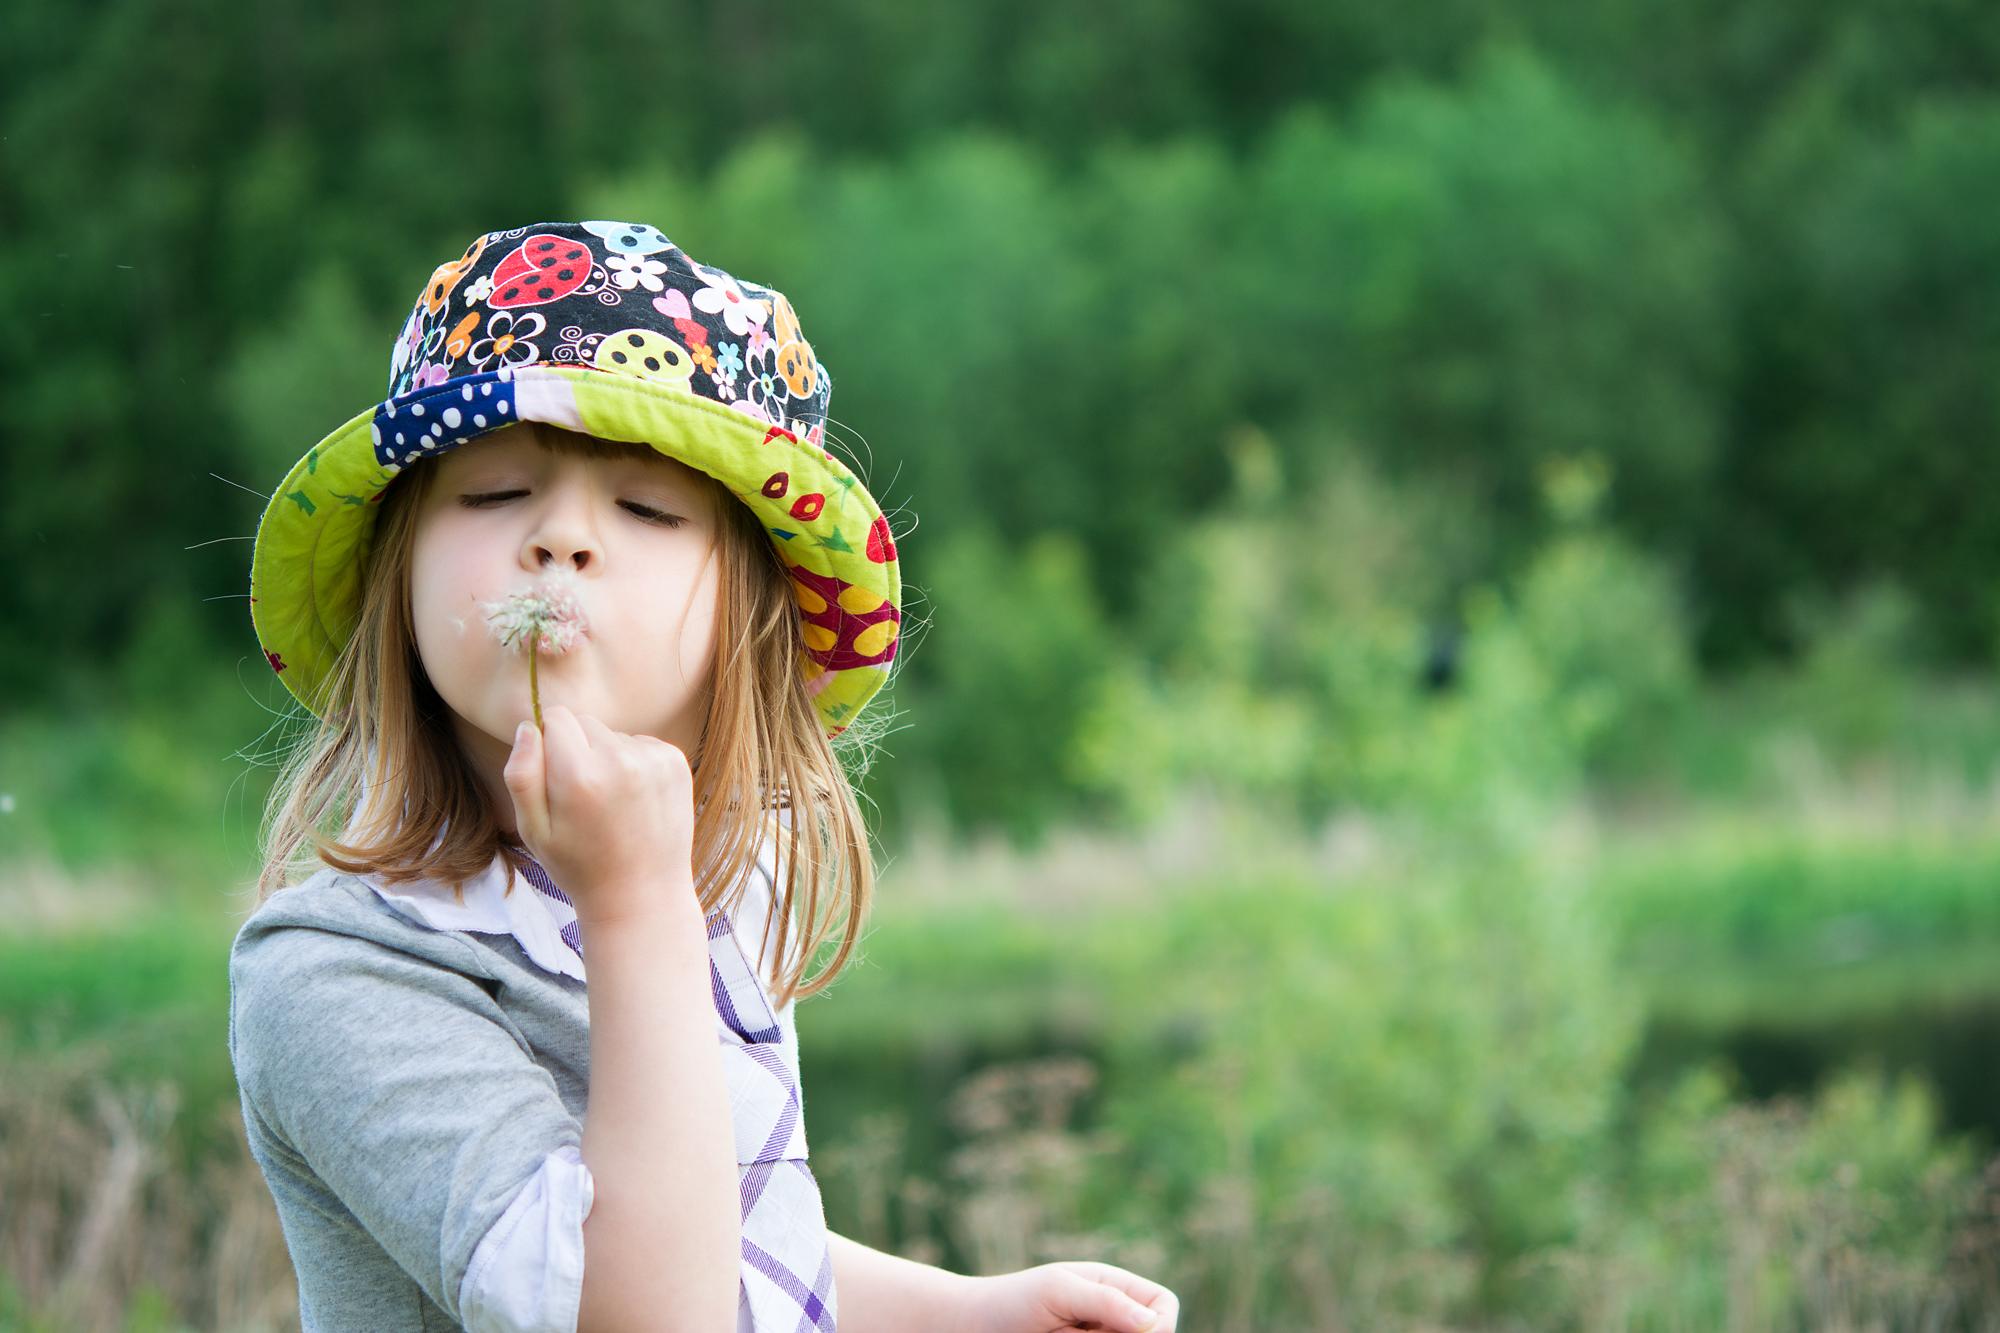 child portrait - making wishes